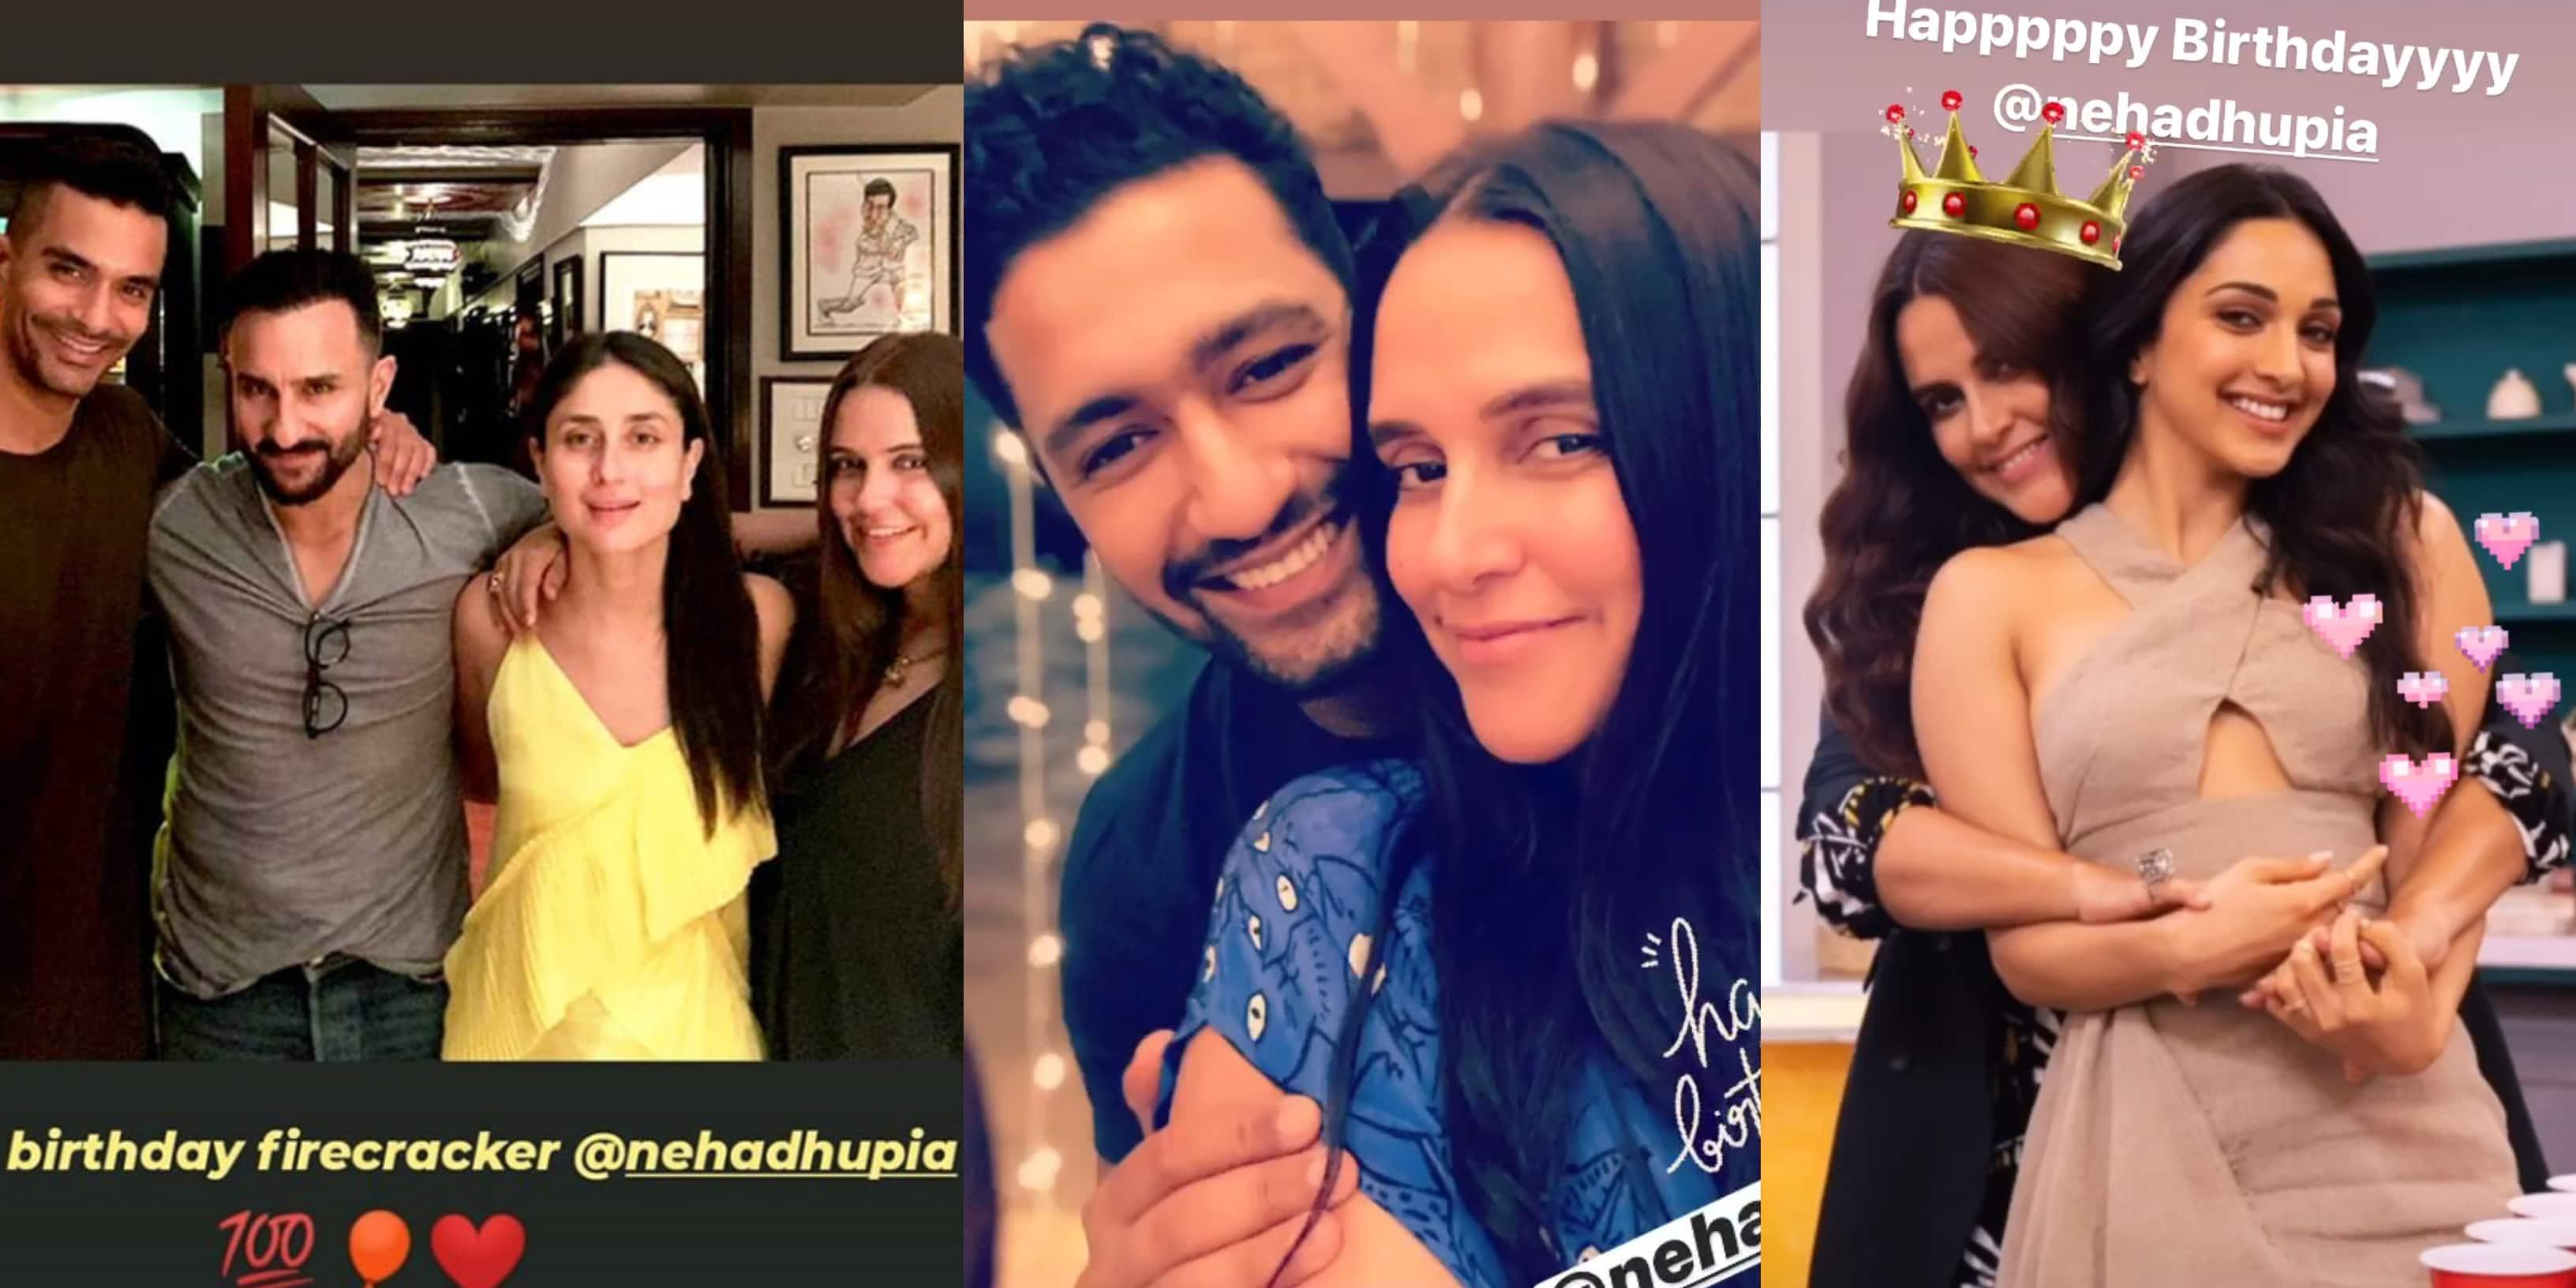 Happy Birthday Neha Dhupia: Kareena Kapoor, Vicky Kaushal, Kiara Advani And Other Stars Wish The Actress